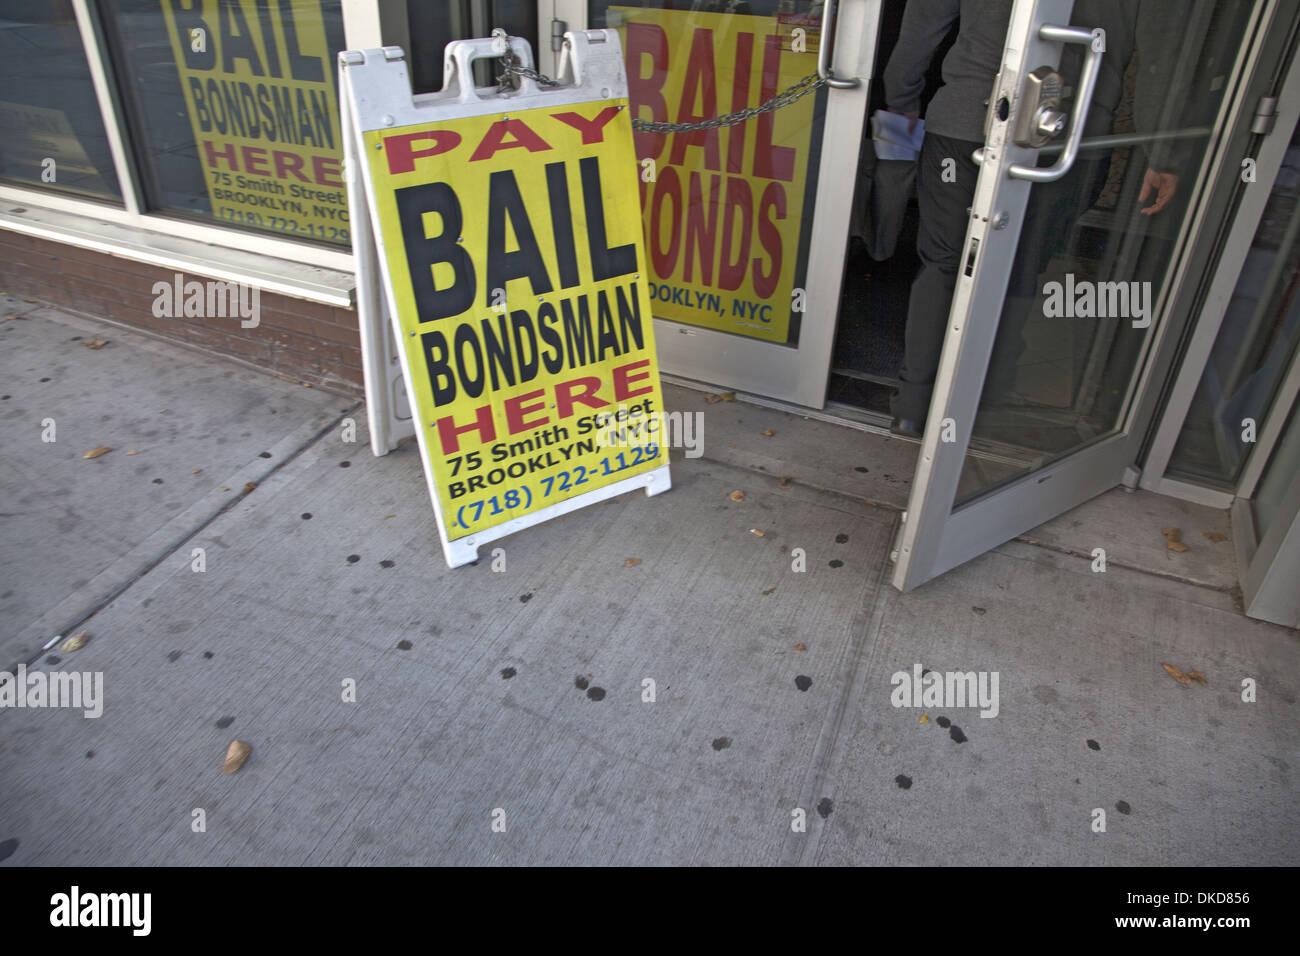 Bail Bondsman across the street from the city jail in Brooklyn, NY. - Stock Image